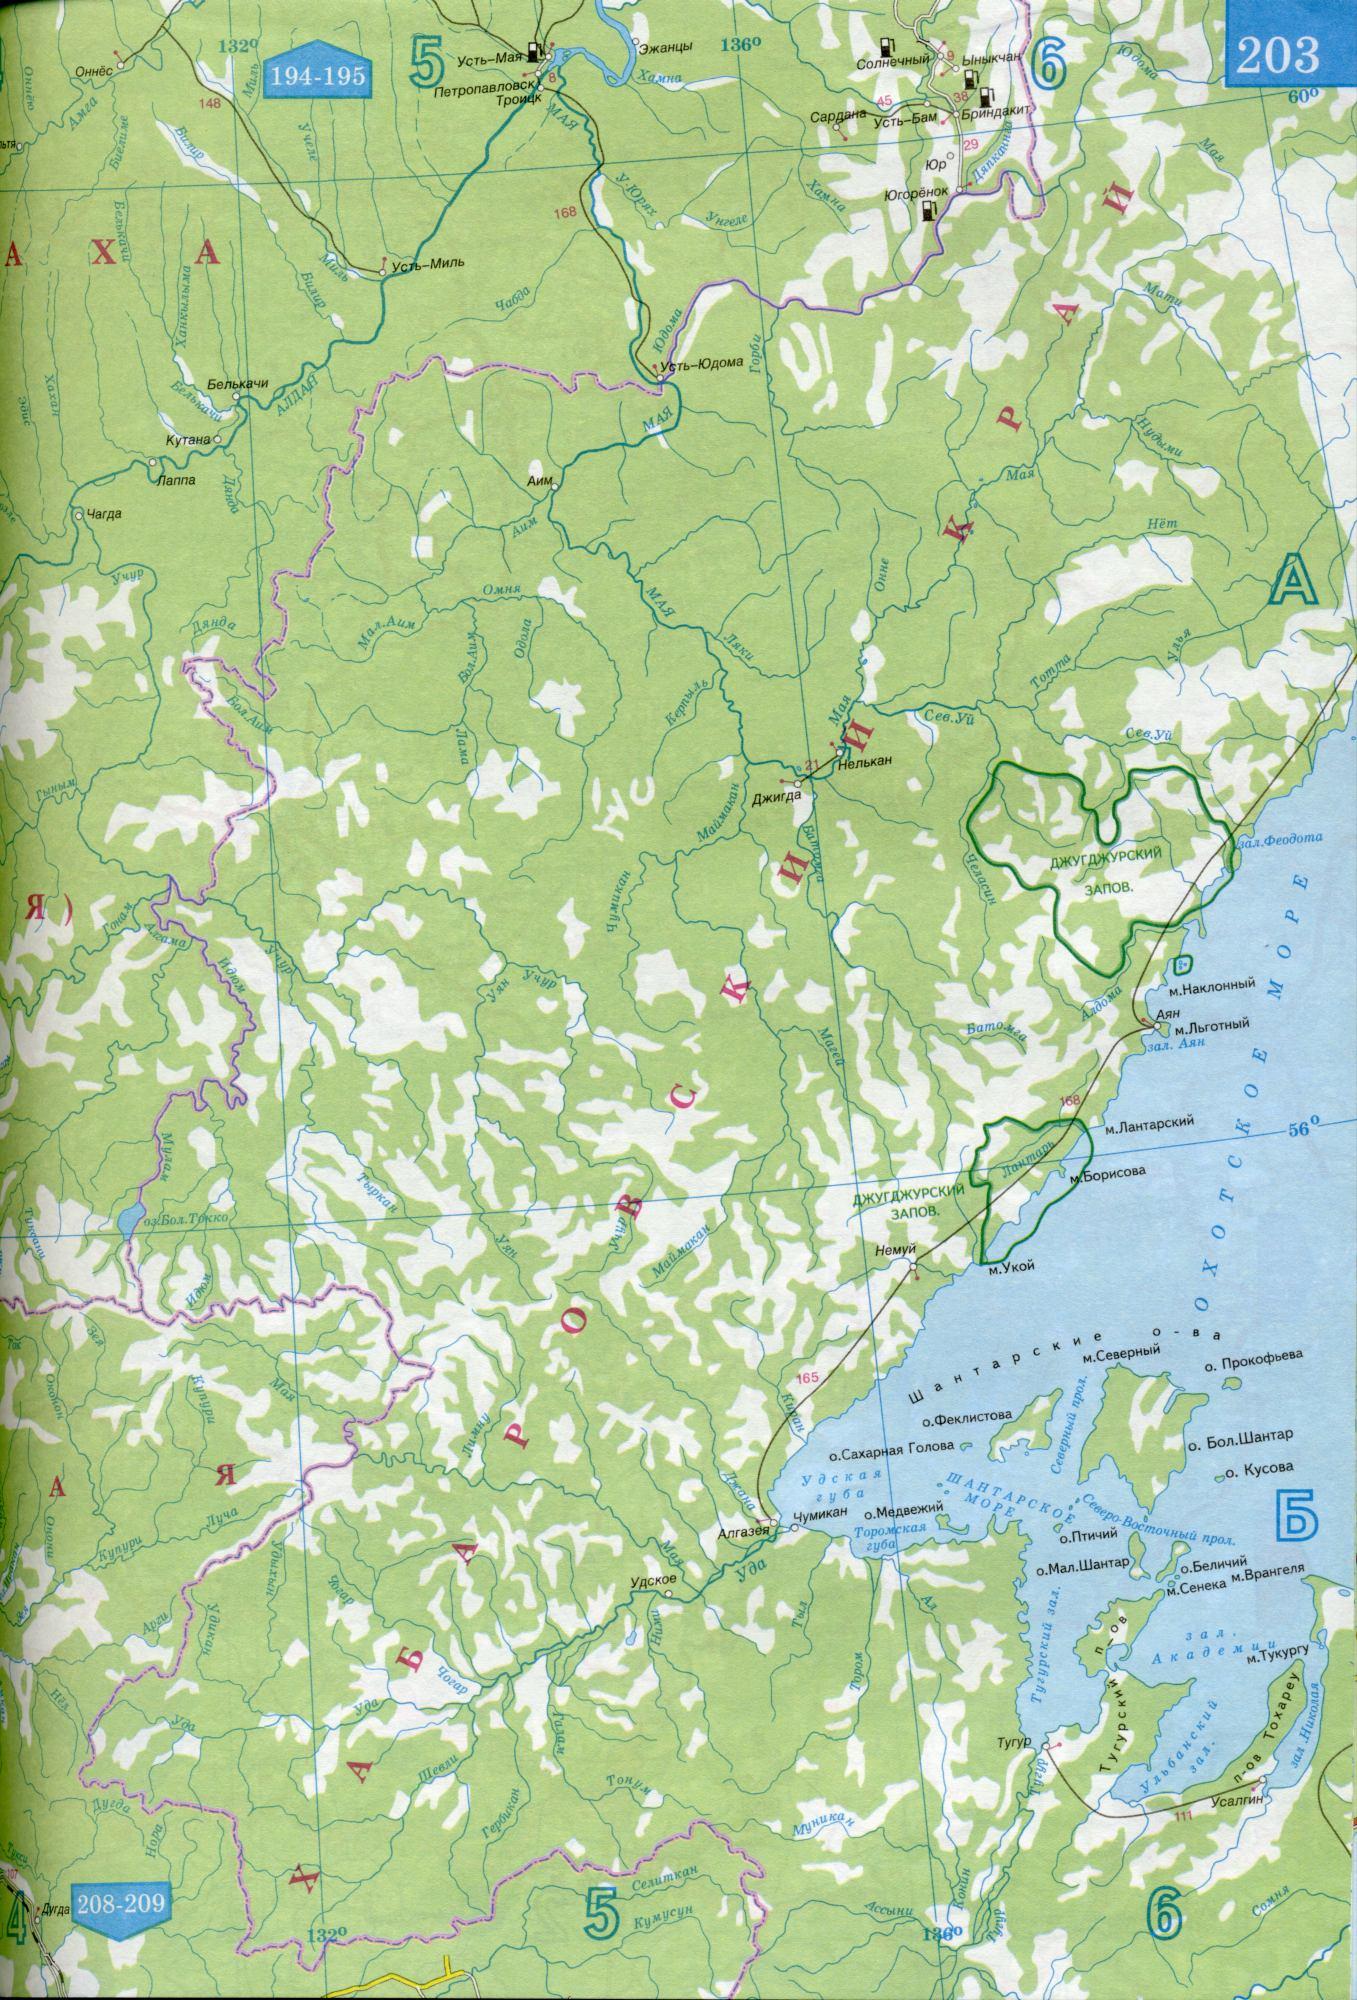 Карта Амурской области север 1см = 30км. Карта ...: http://www.raster-maps.com/map-of-russia-32/